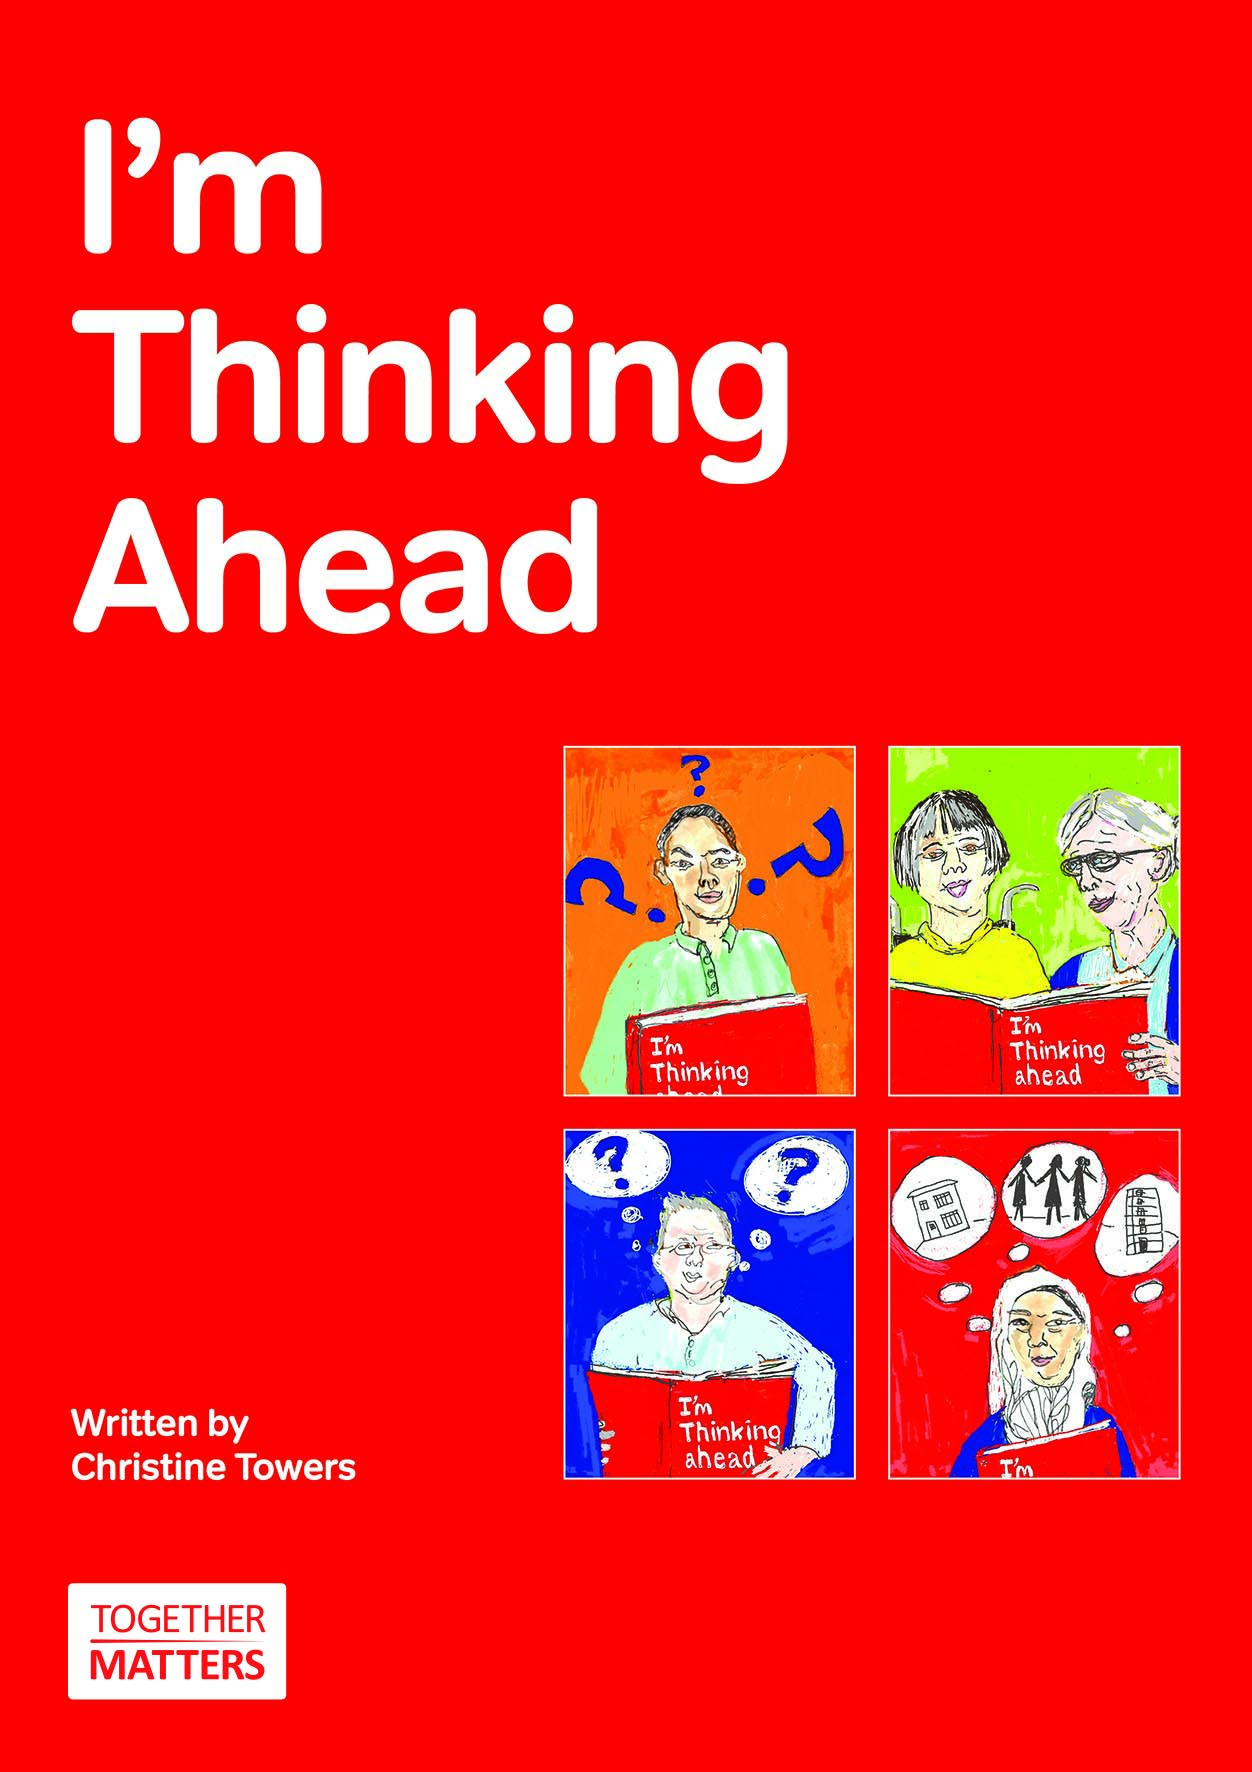 im thinking ahead